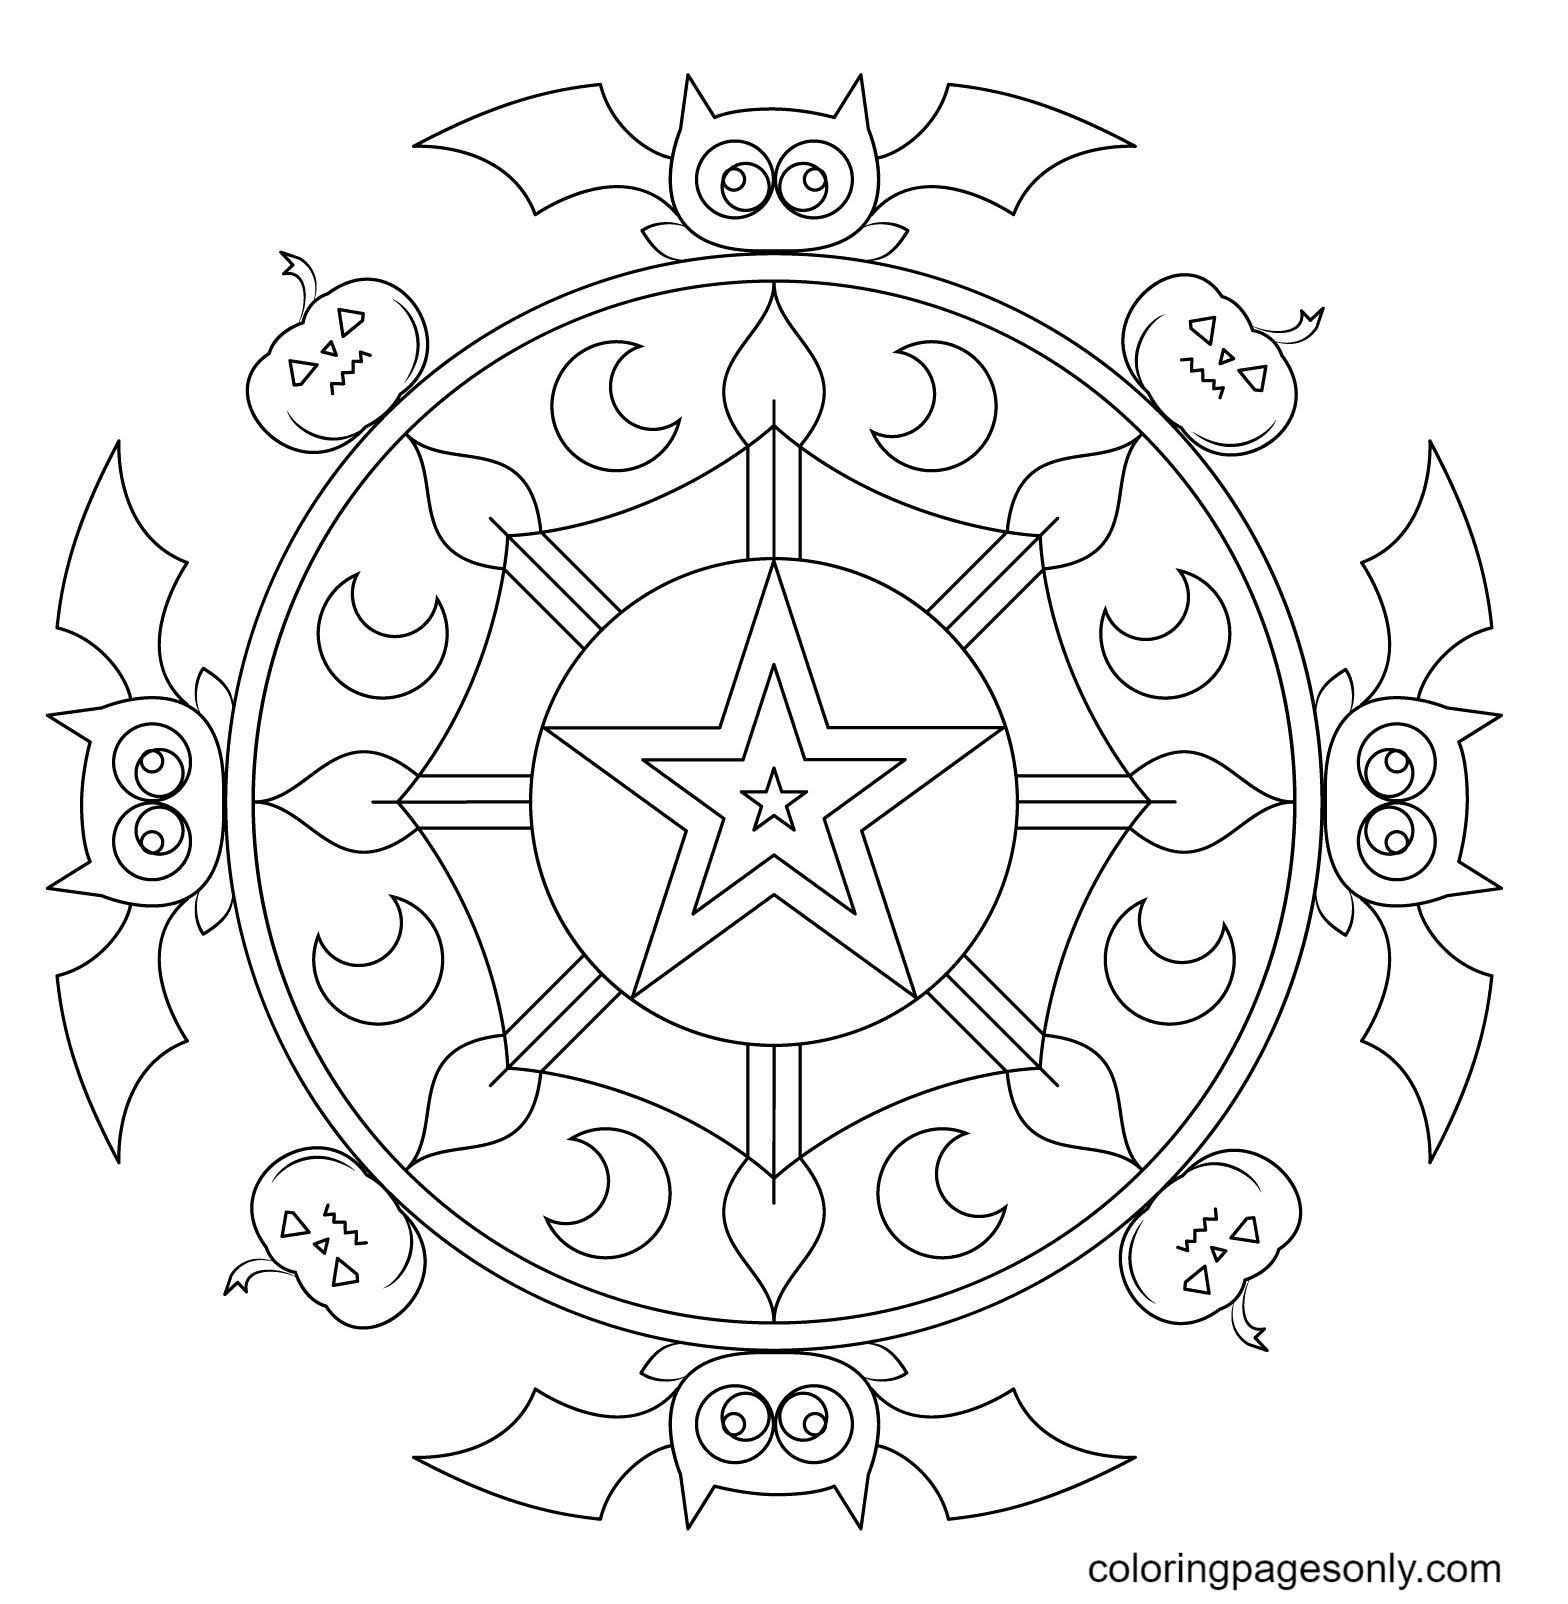 Halloween Mandala with Bats and Pumpkins Coloring Page